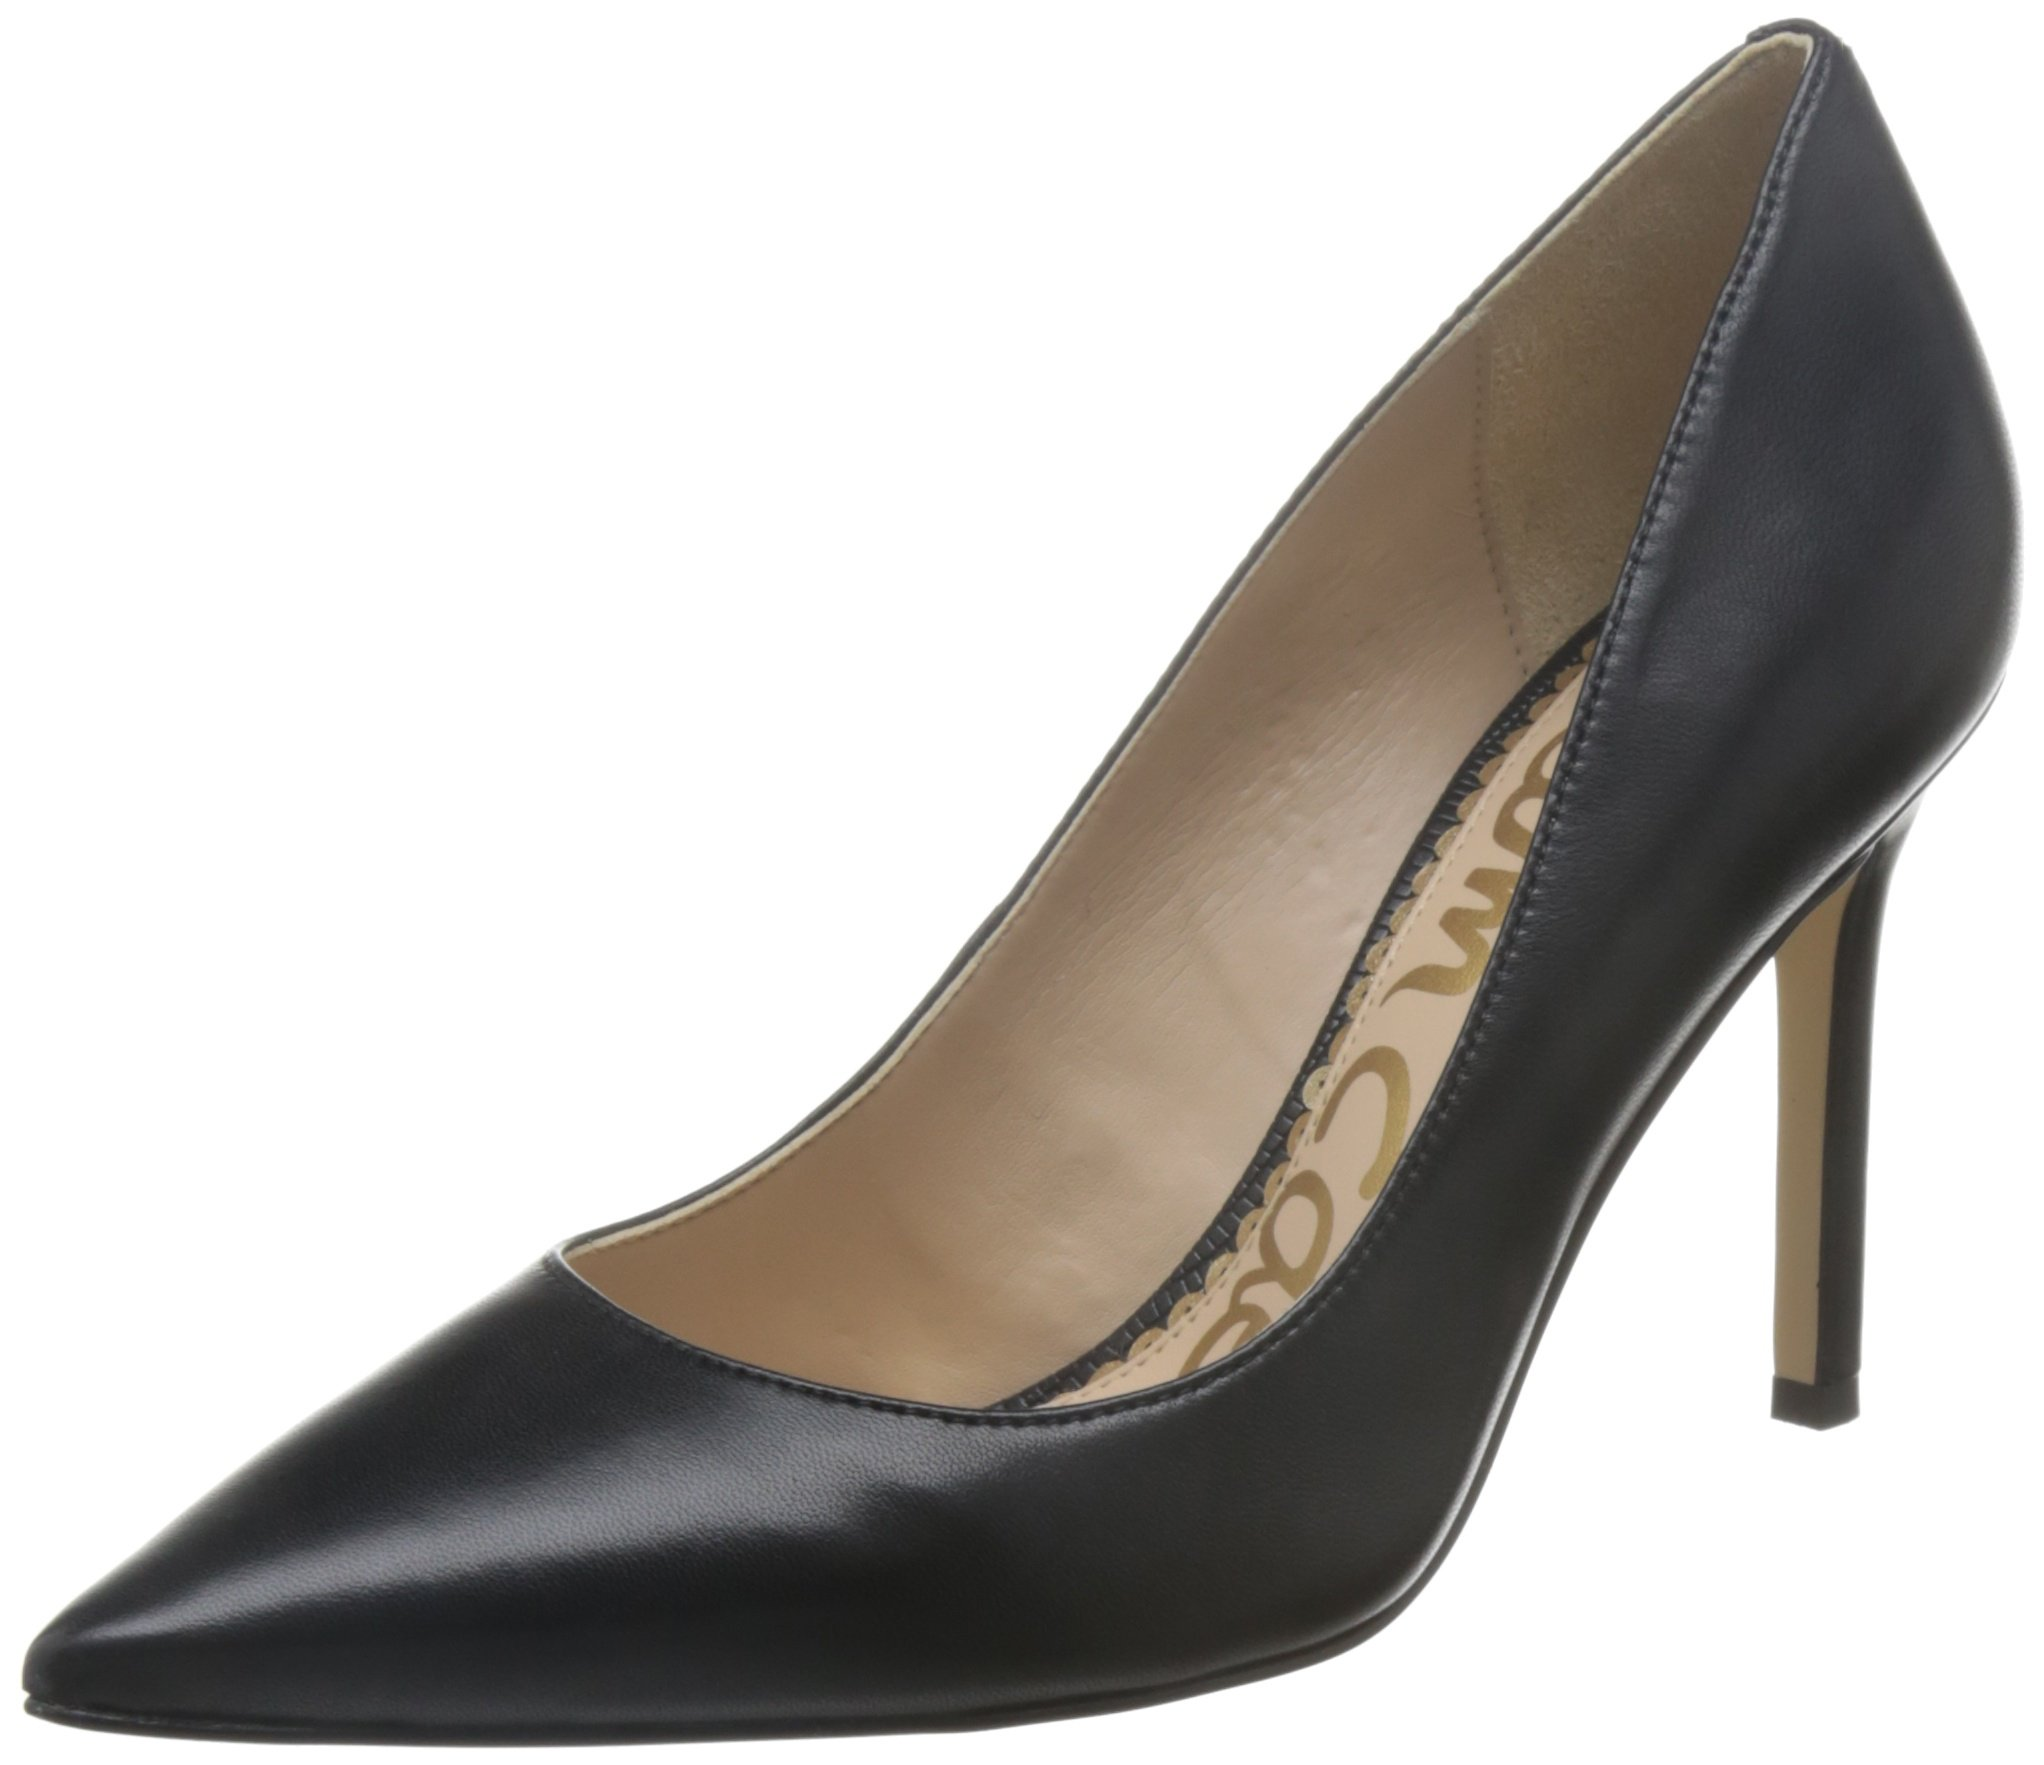 Sam Edelman Women's Hazel Dress Pump, Black Leather, 7 M US